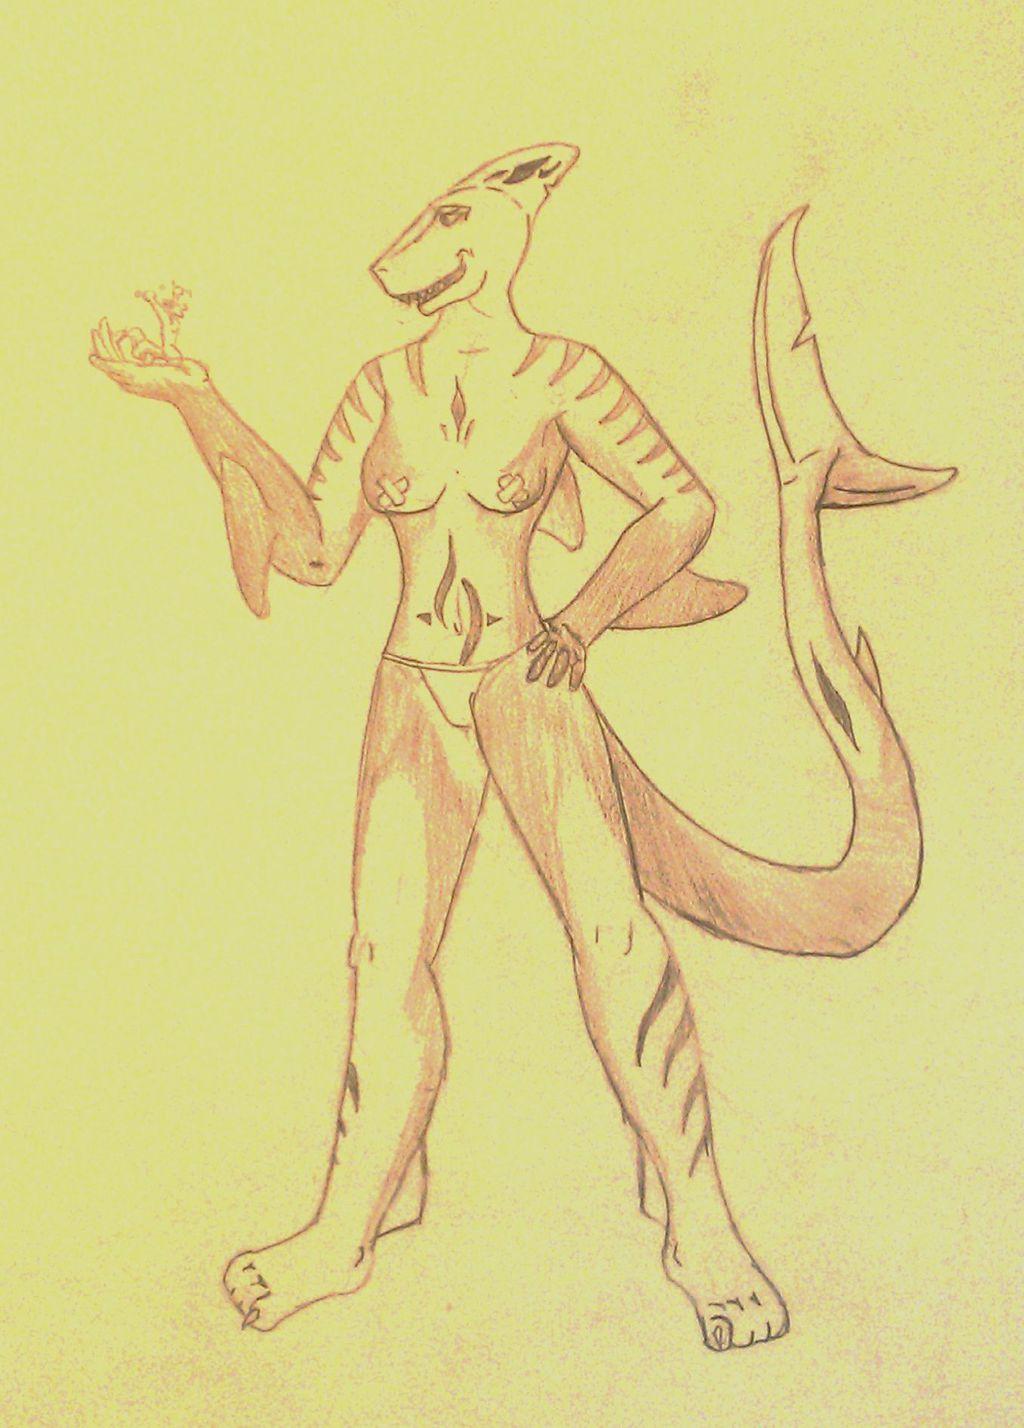 Most recent image: My shark girl Leona